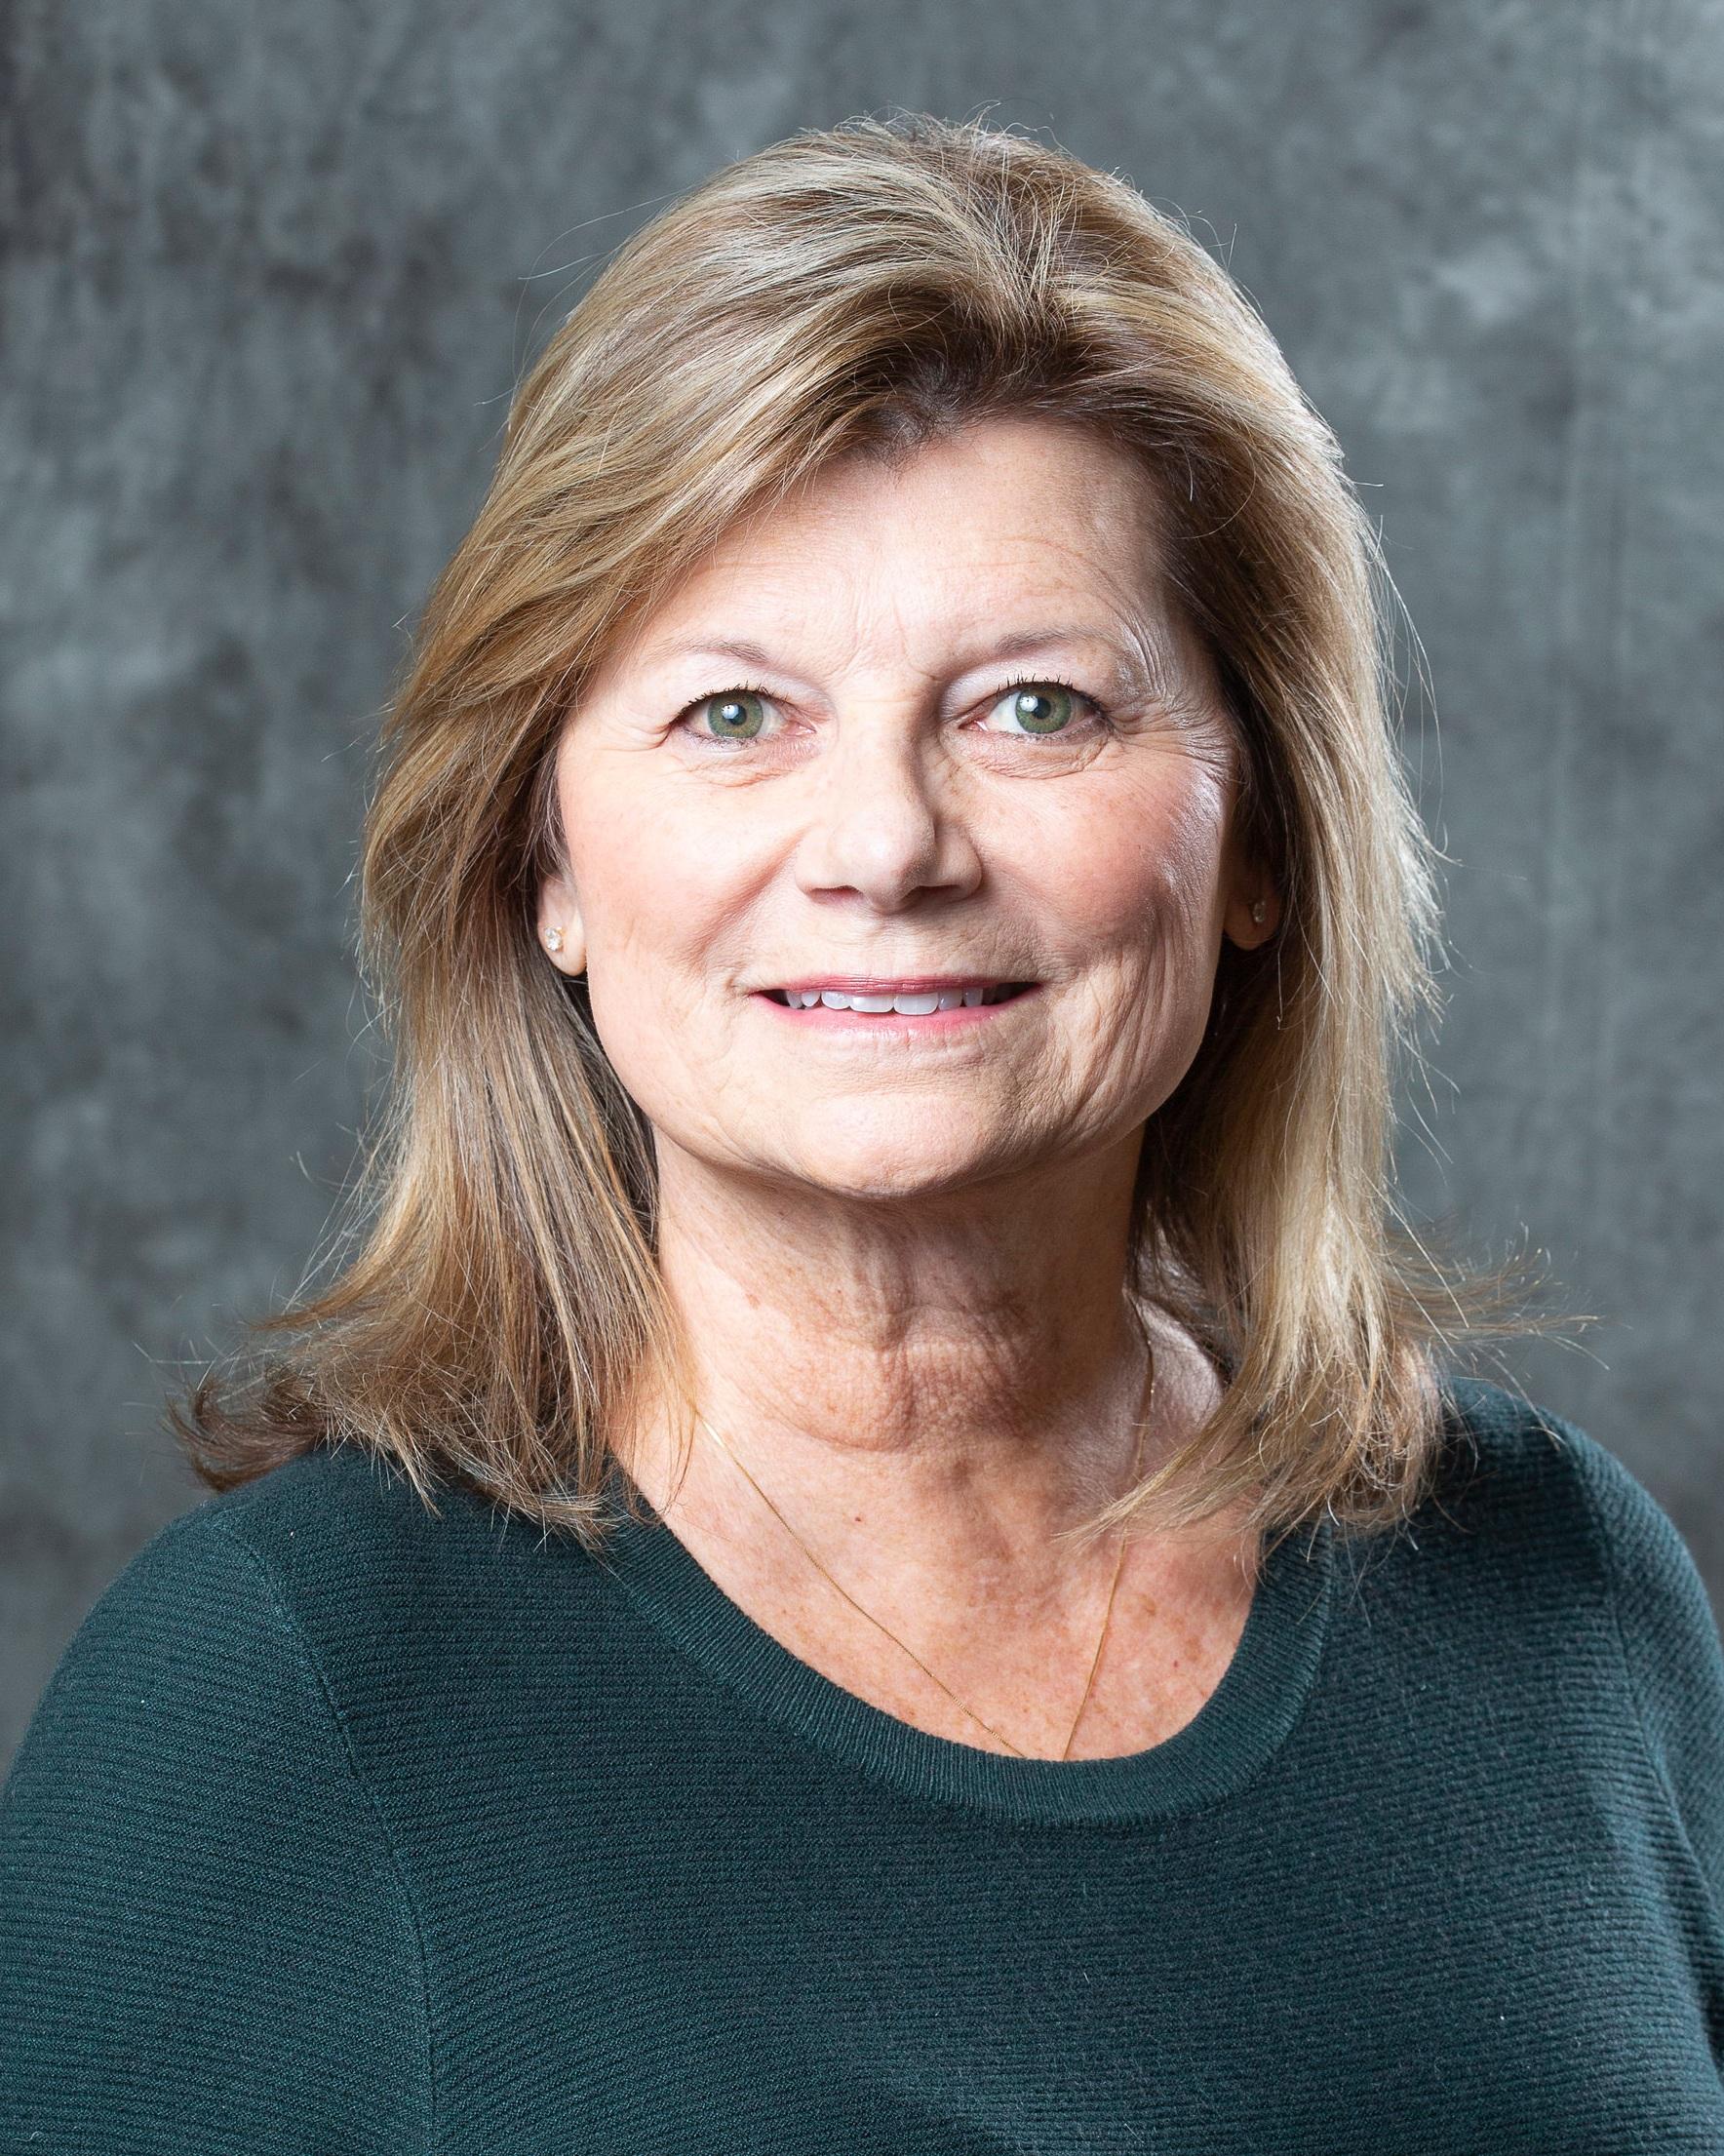 Advanced Psychiatric Mental Health Nurse Practitioner | Cheryl Young